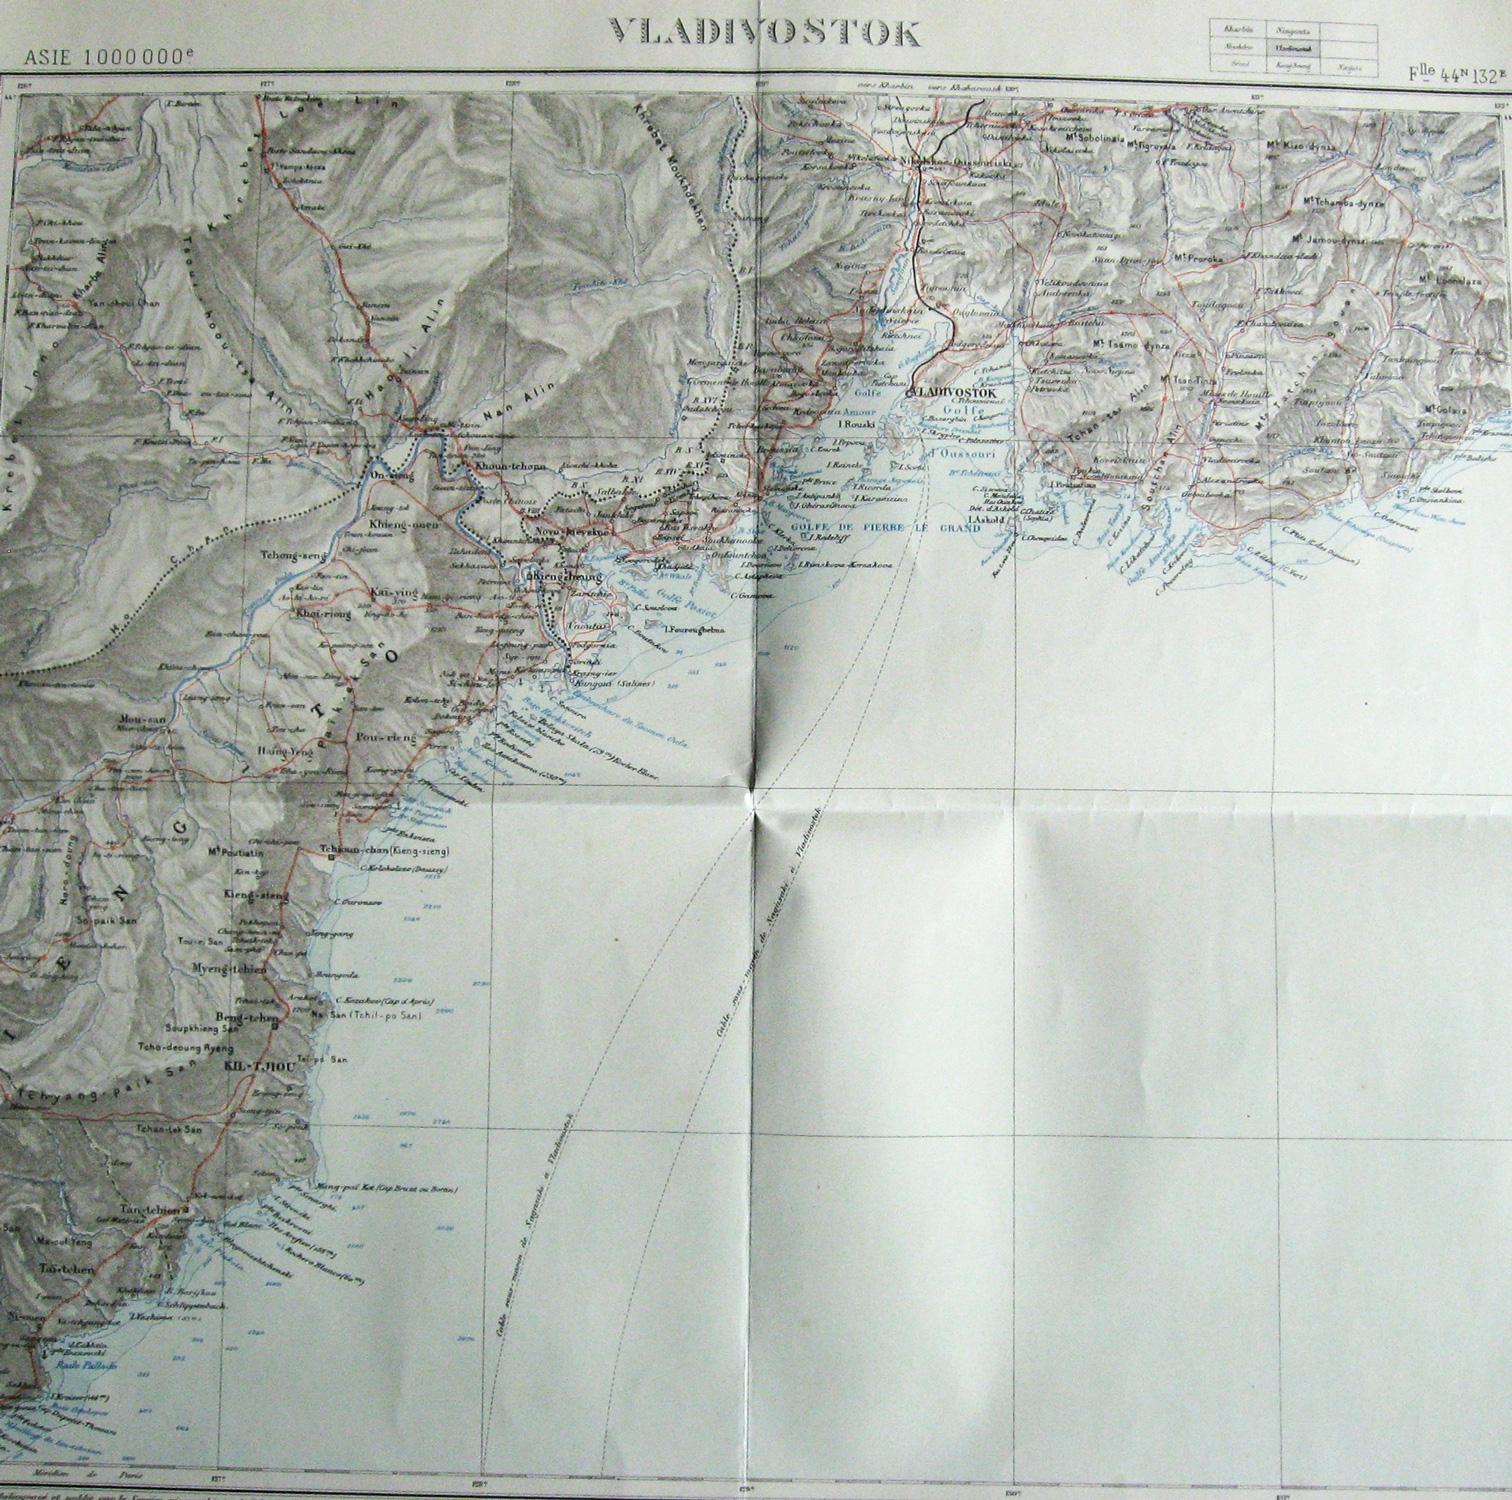 Asie au 1. 000. 000e : Vladivostok